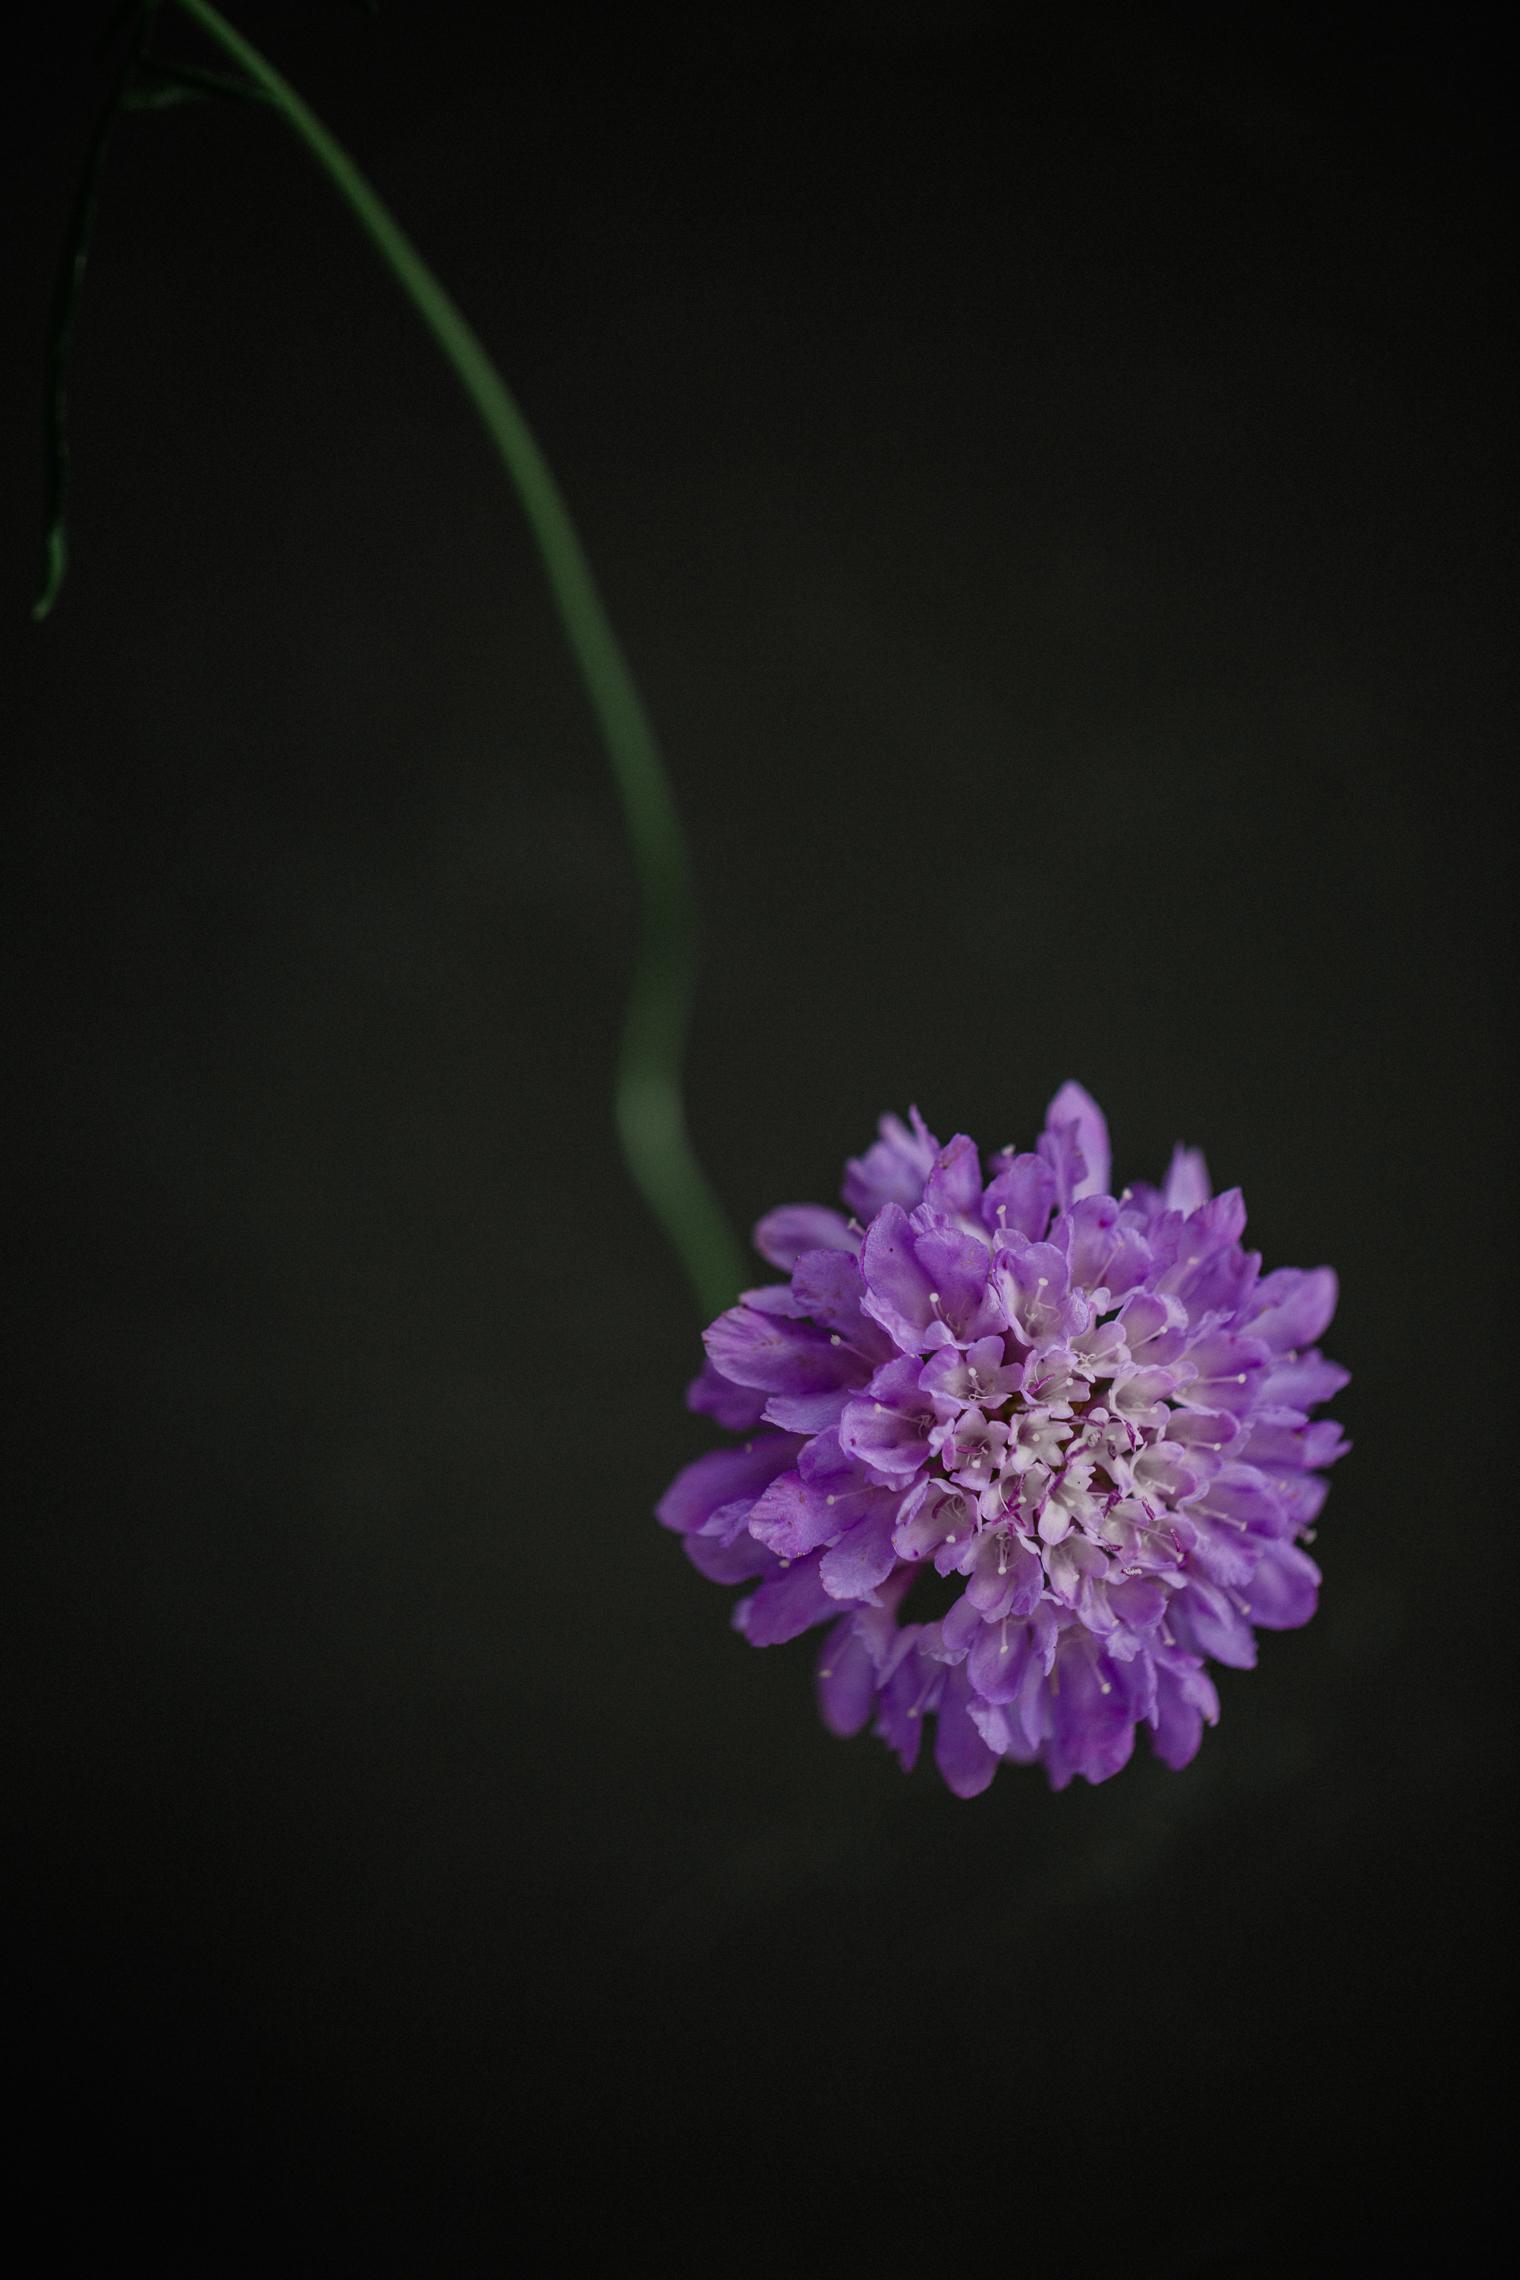 McQueens Flowers Arriving in Mayfair   Floristry Industry Insight